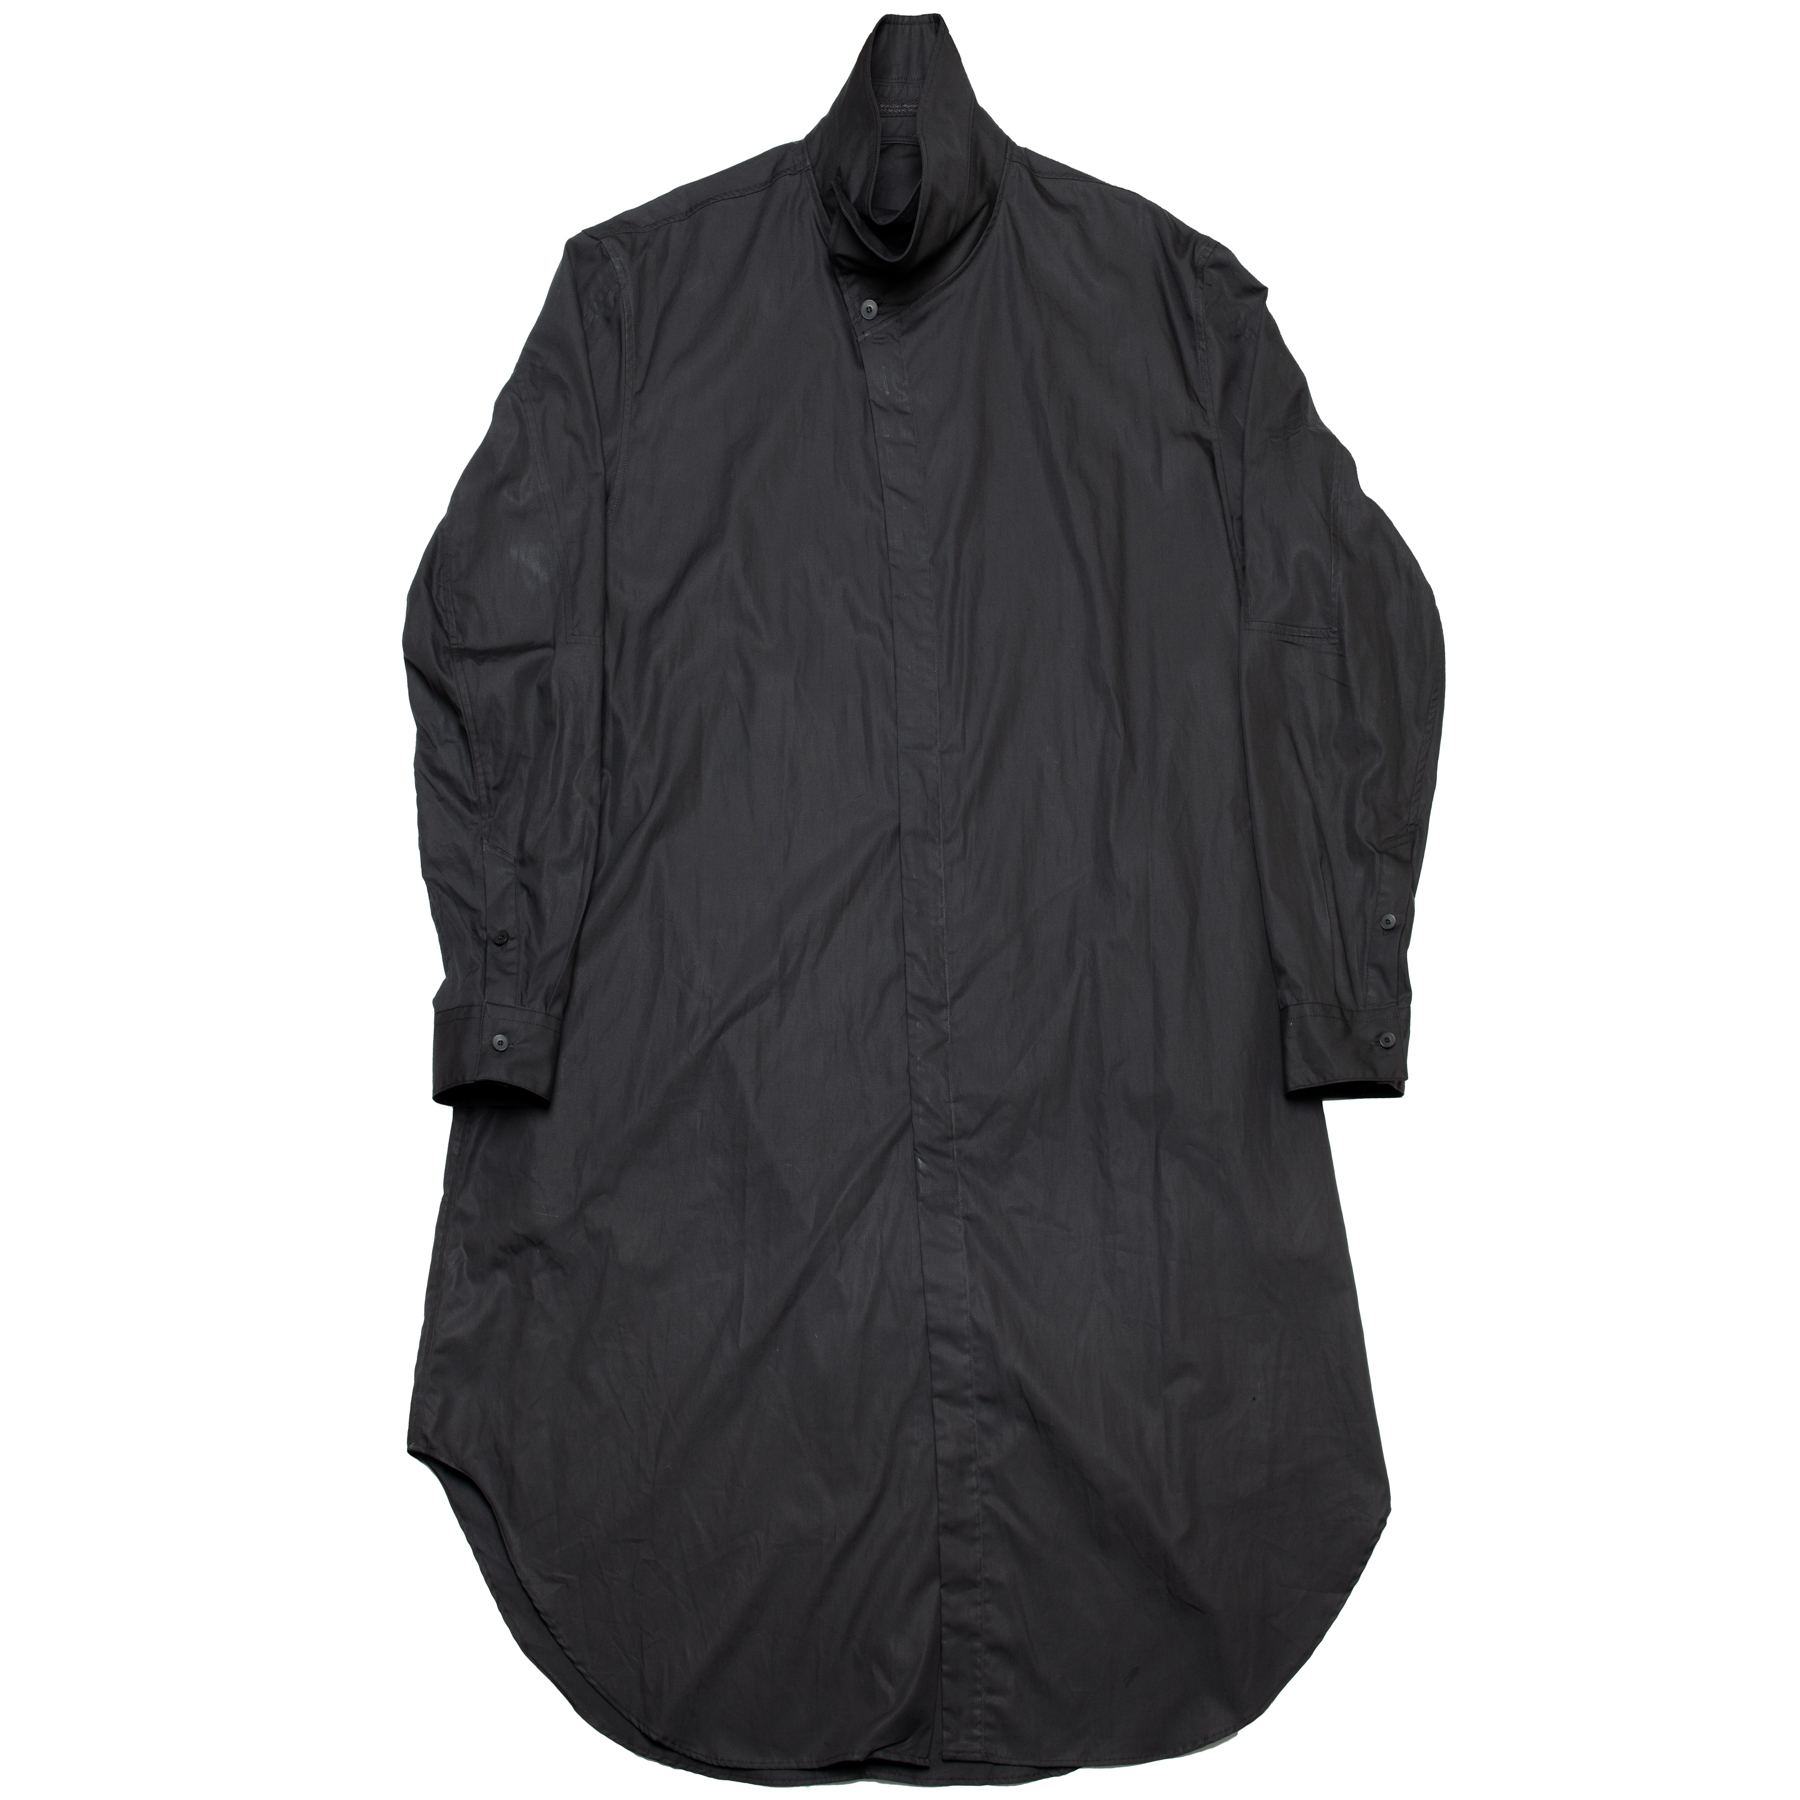 637SHM1-BLACK / カバードネックロングシャツ